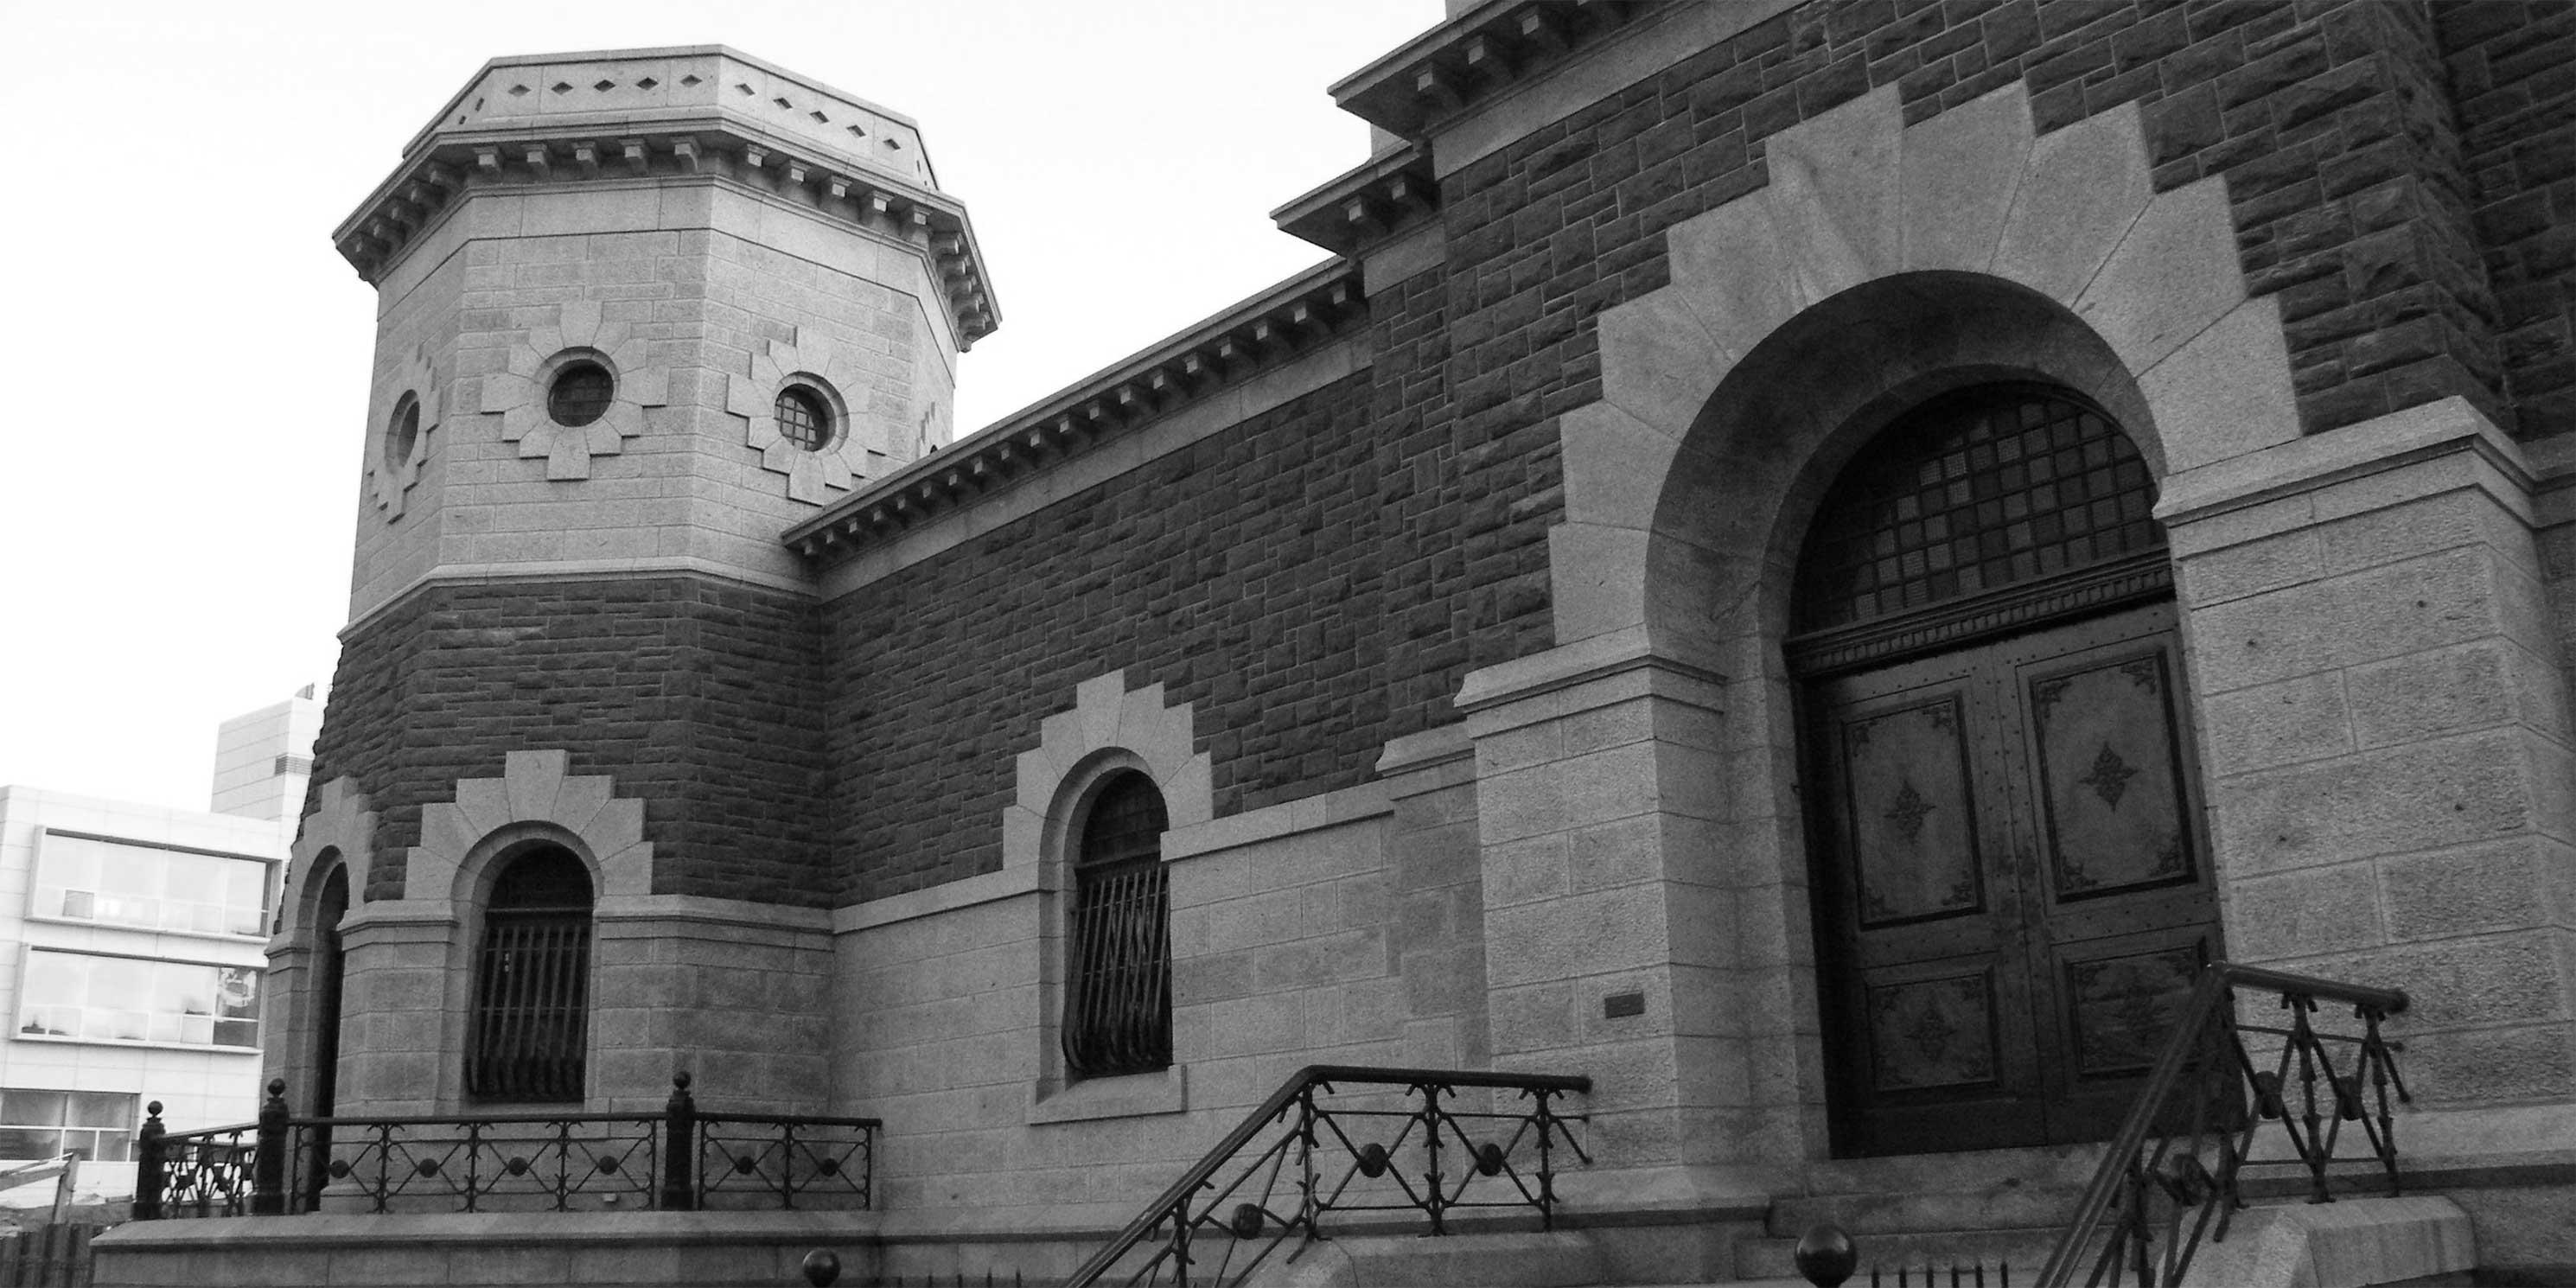 The stone and brick Croton Aqueduct Gatehouse at 135th Street